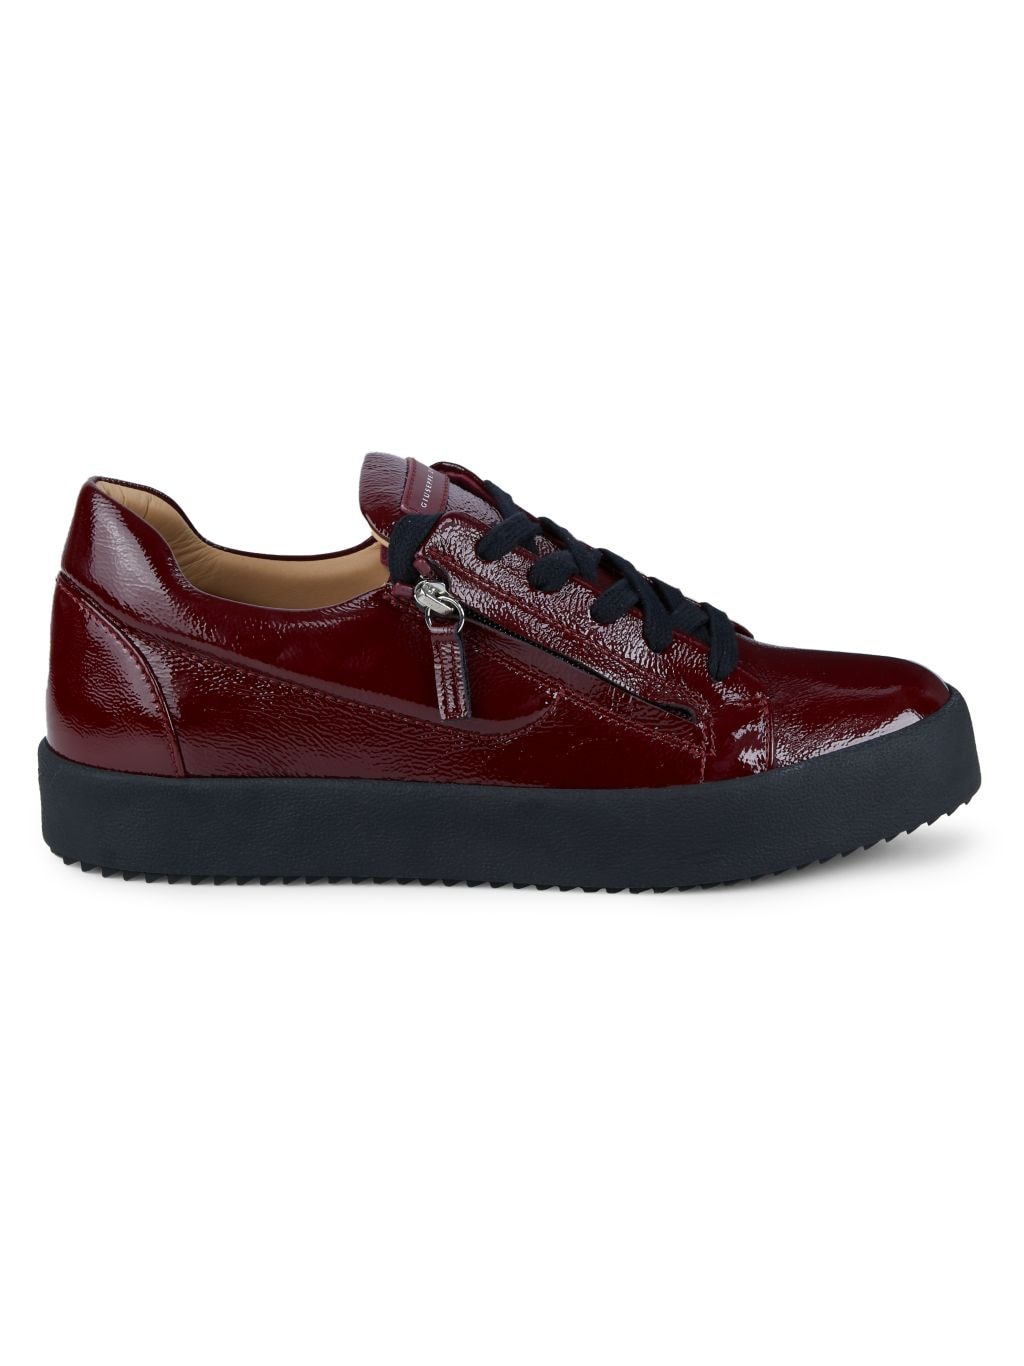 Giuseppe Zanotti Double-Zip Patent Leather Sneakers